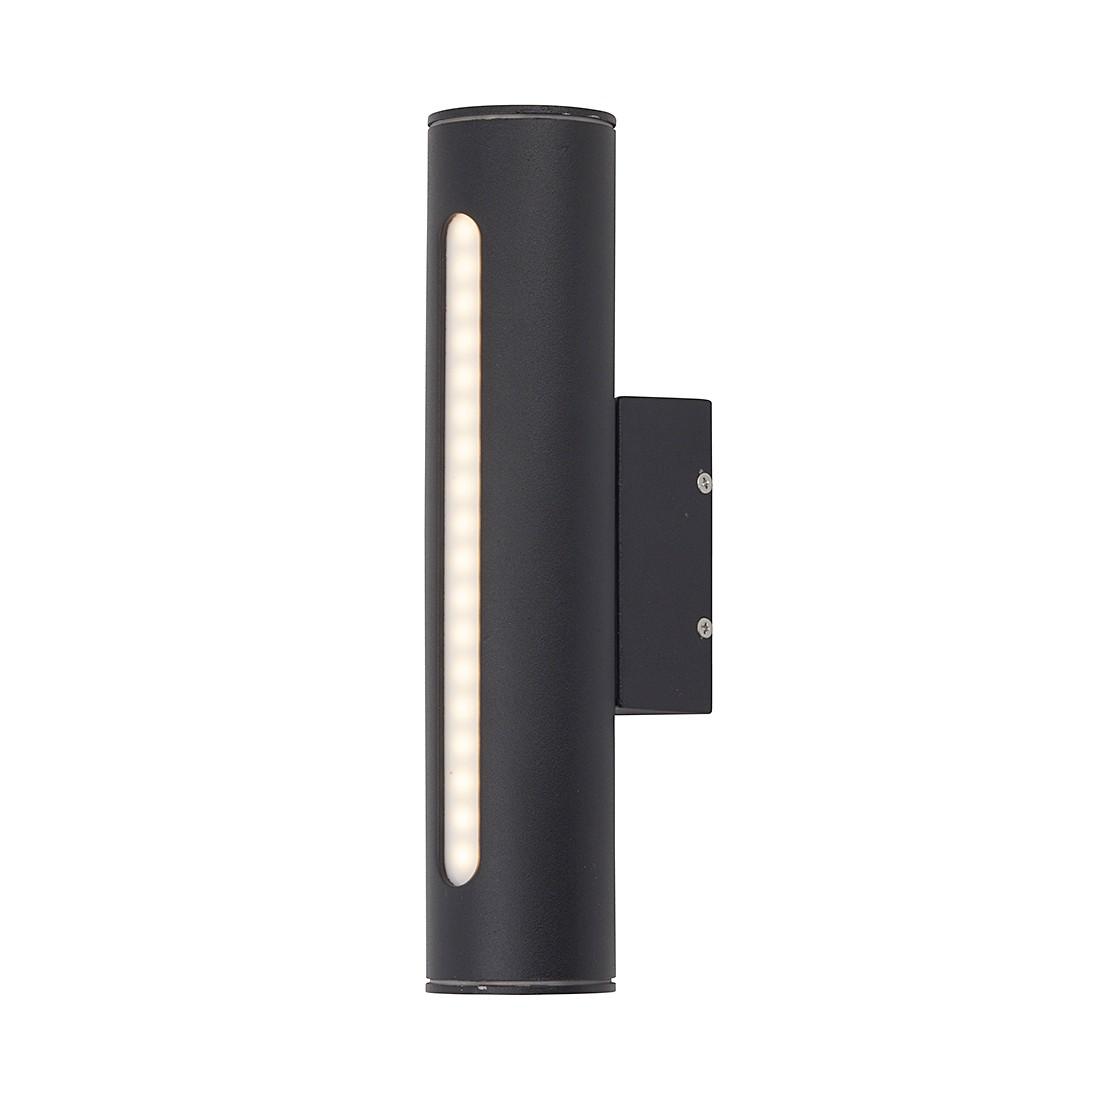 EEK A+, Außenleuchte Sally - Aluminium/Alu-Druckguss/Kunststoff - Schwarz - 1-flammig, Brilliant